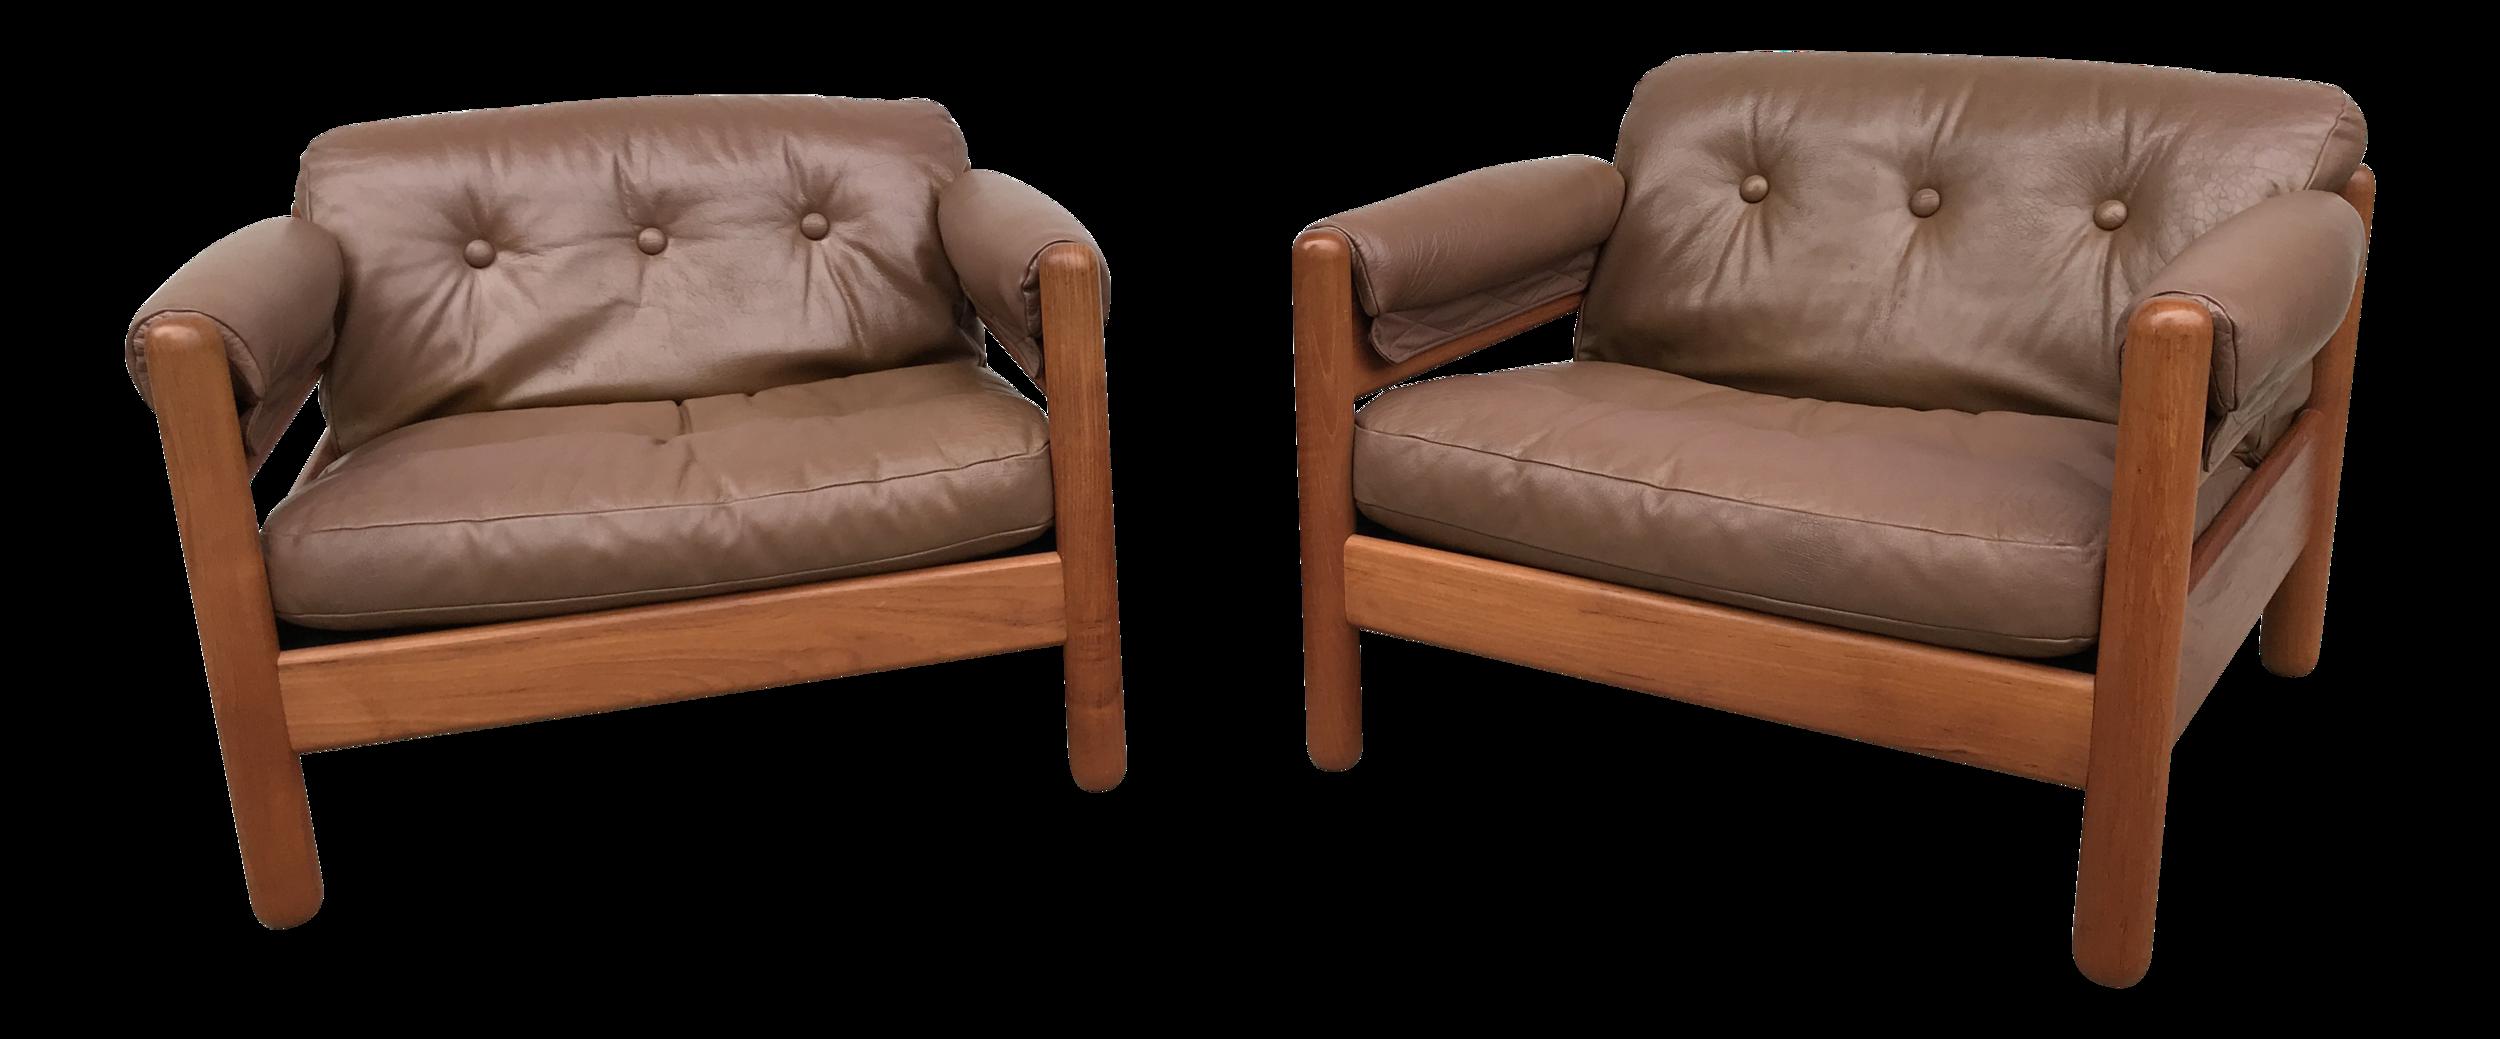 Pair of Makael Laursen Teak & Leather Danish Modern Lounge Chairs